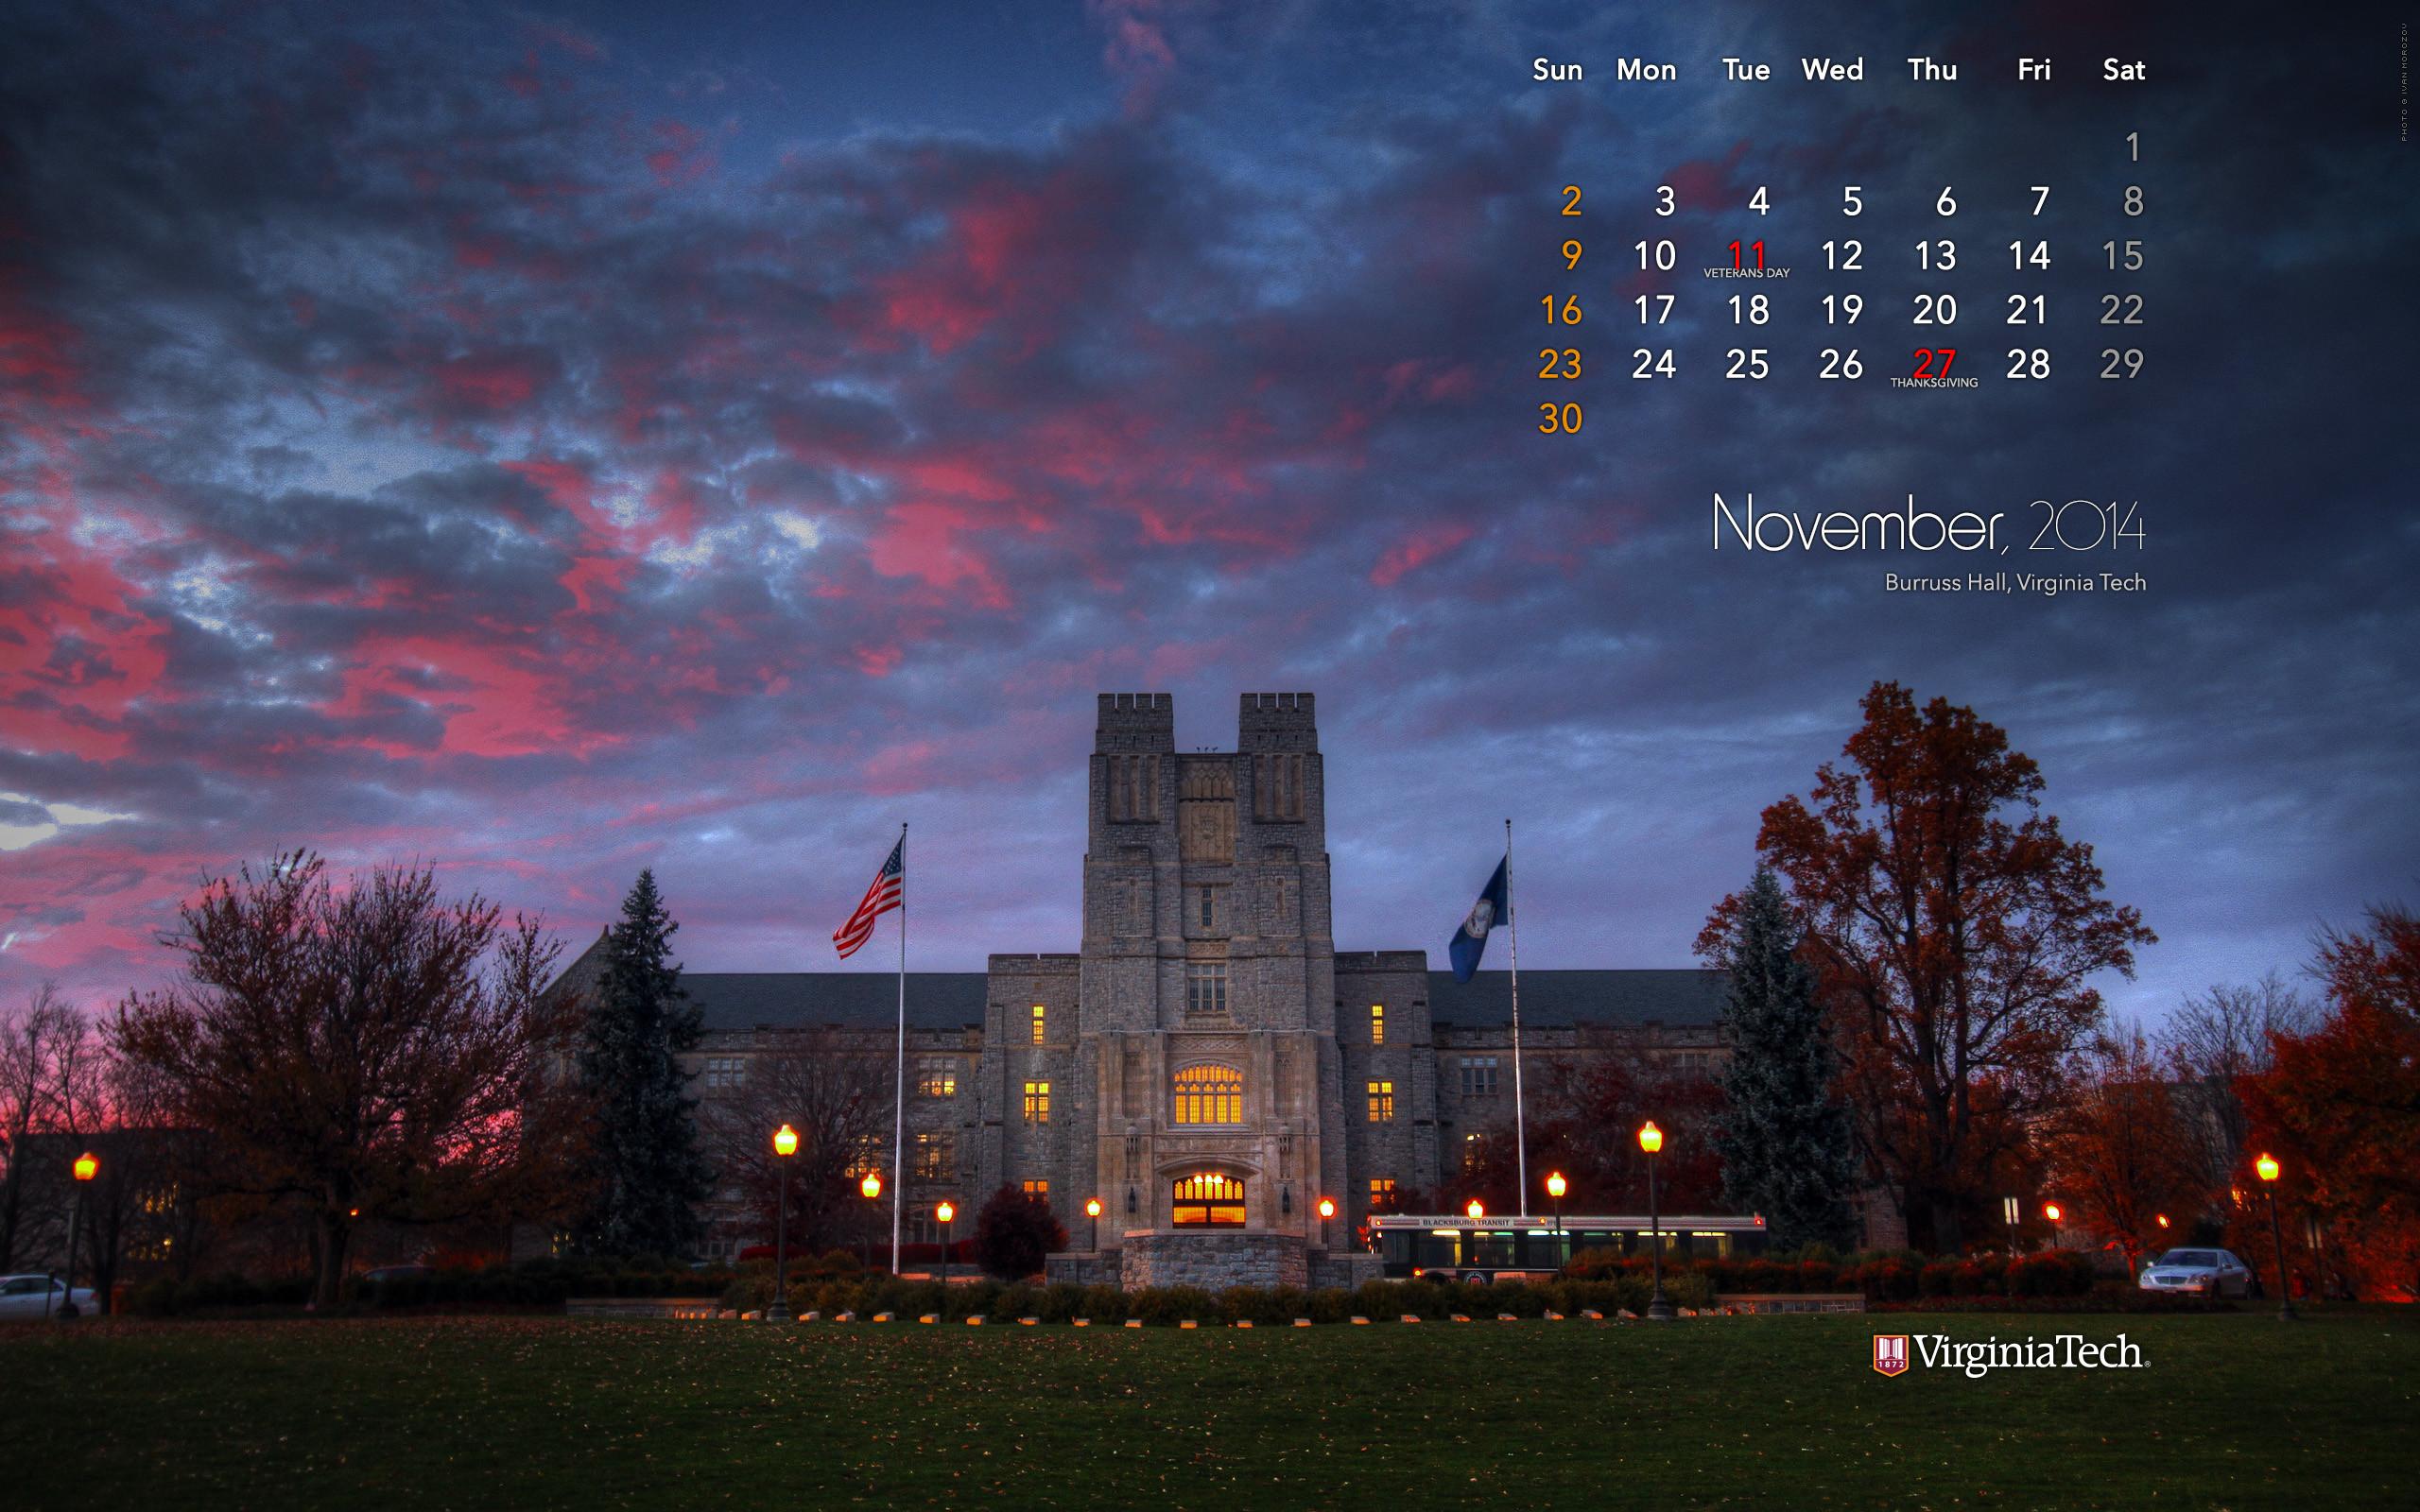 Desktop Wallpaper, November 2014. Virginia Tech. Download: 2560 x 1600 .